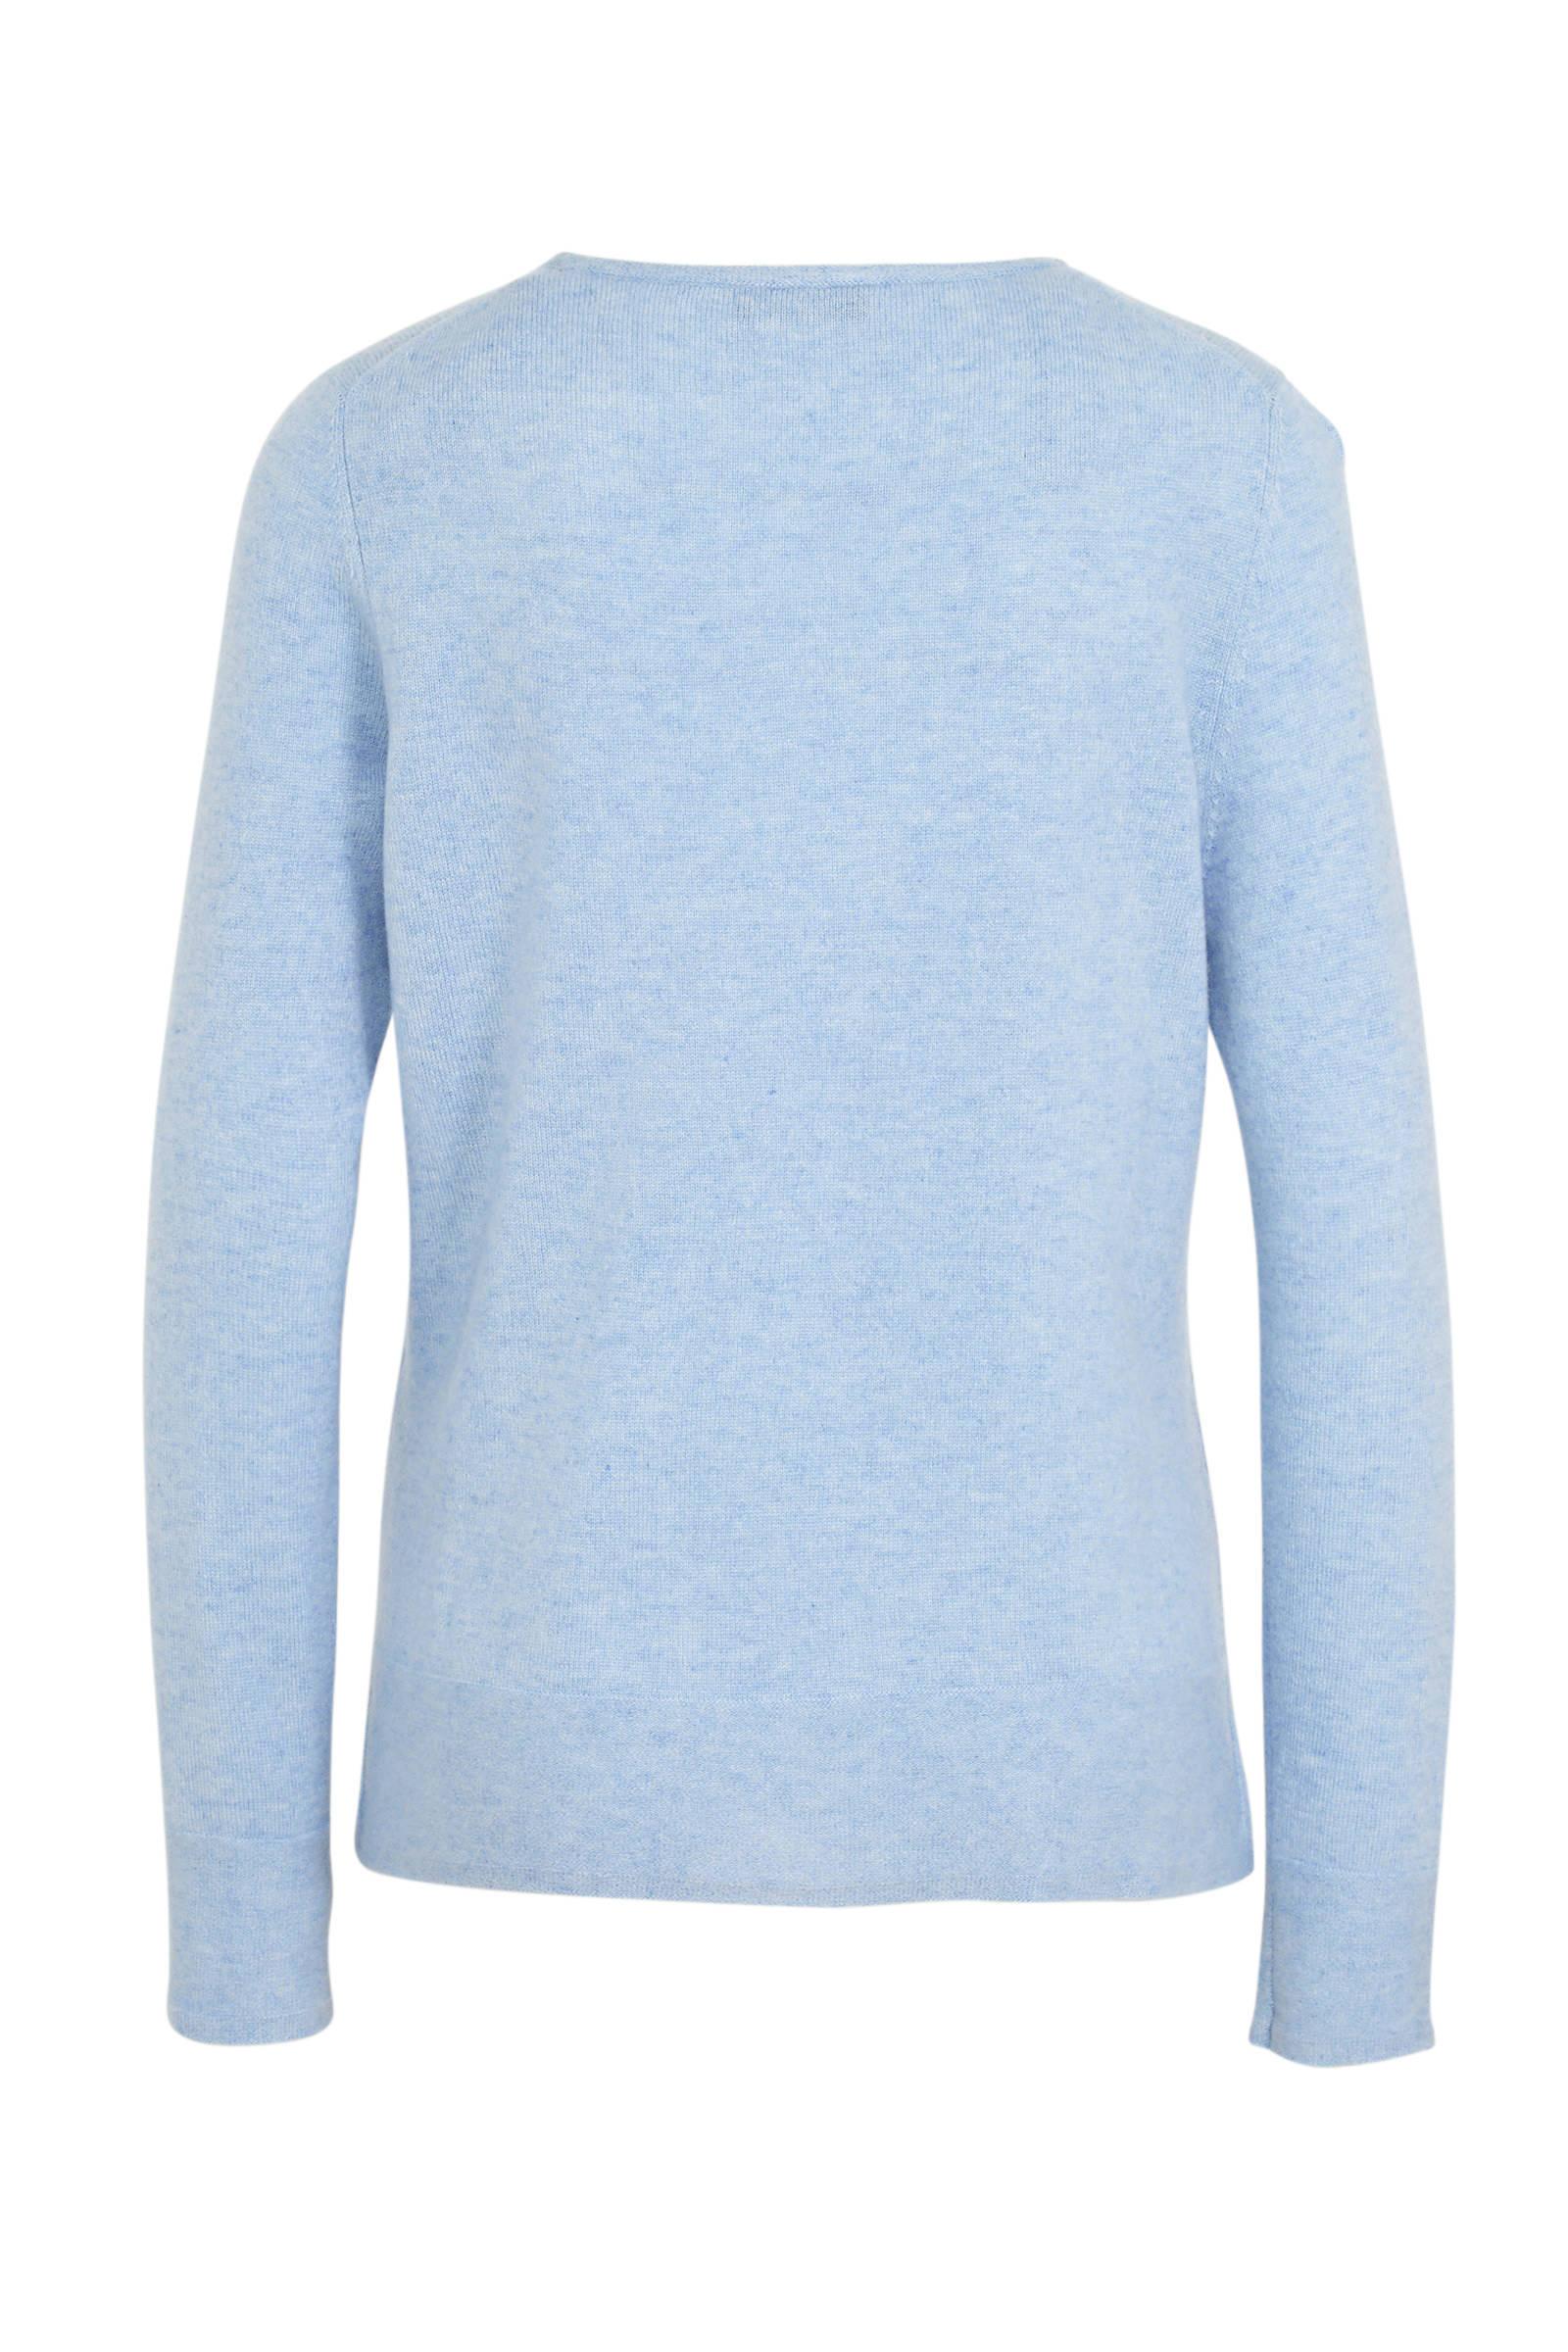 Kasjmier trui Lichtblauw DAMES | H&M NL